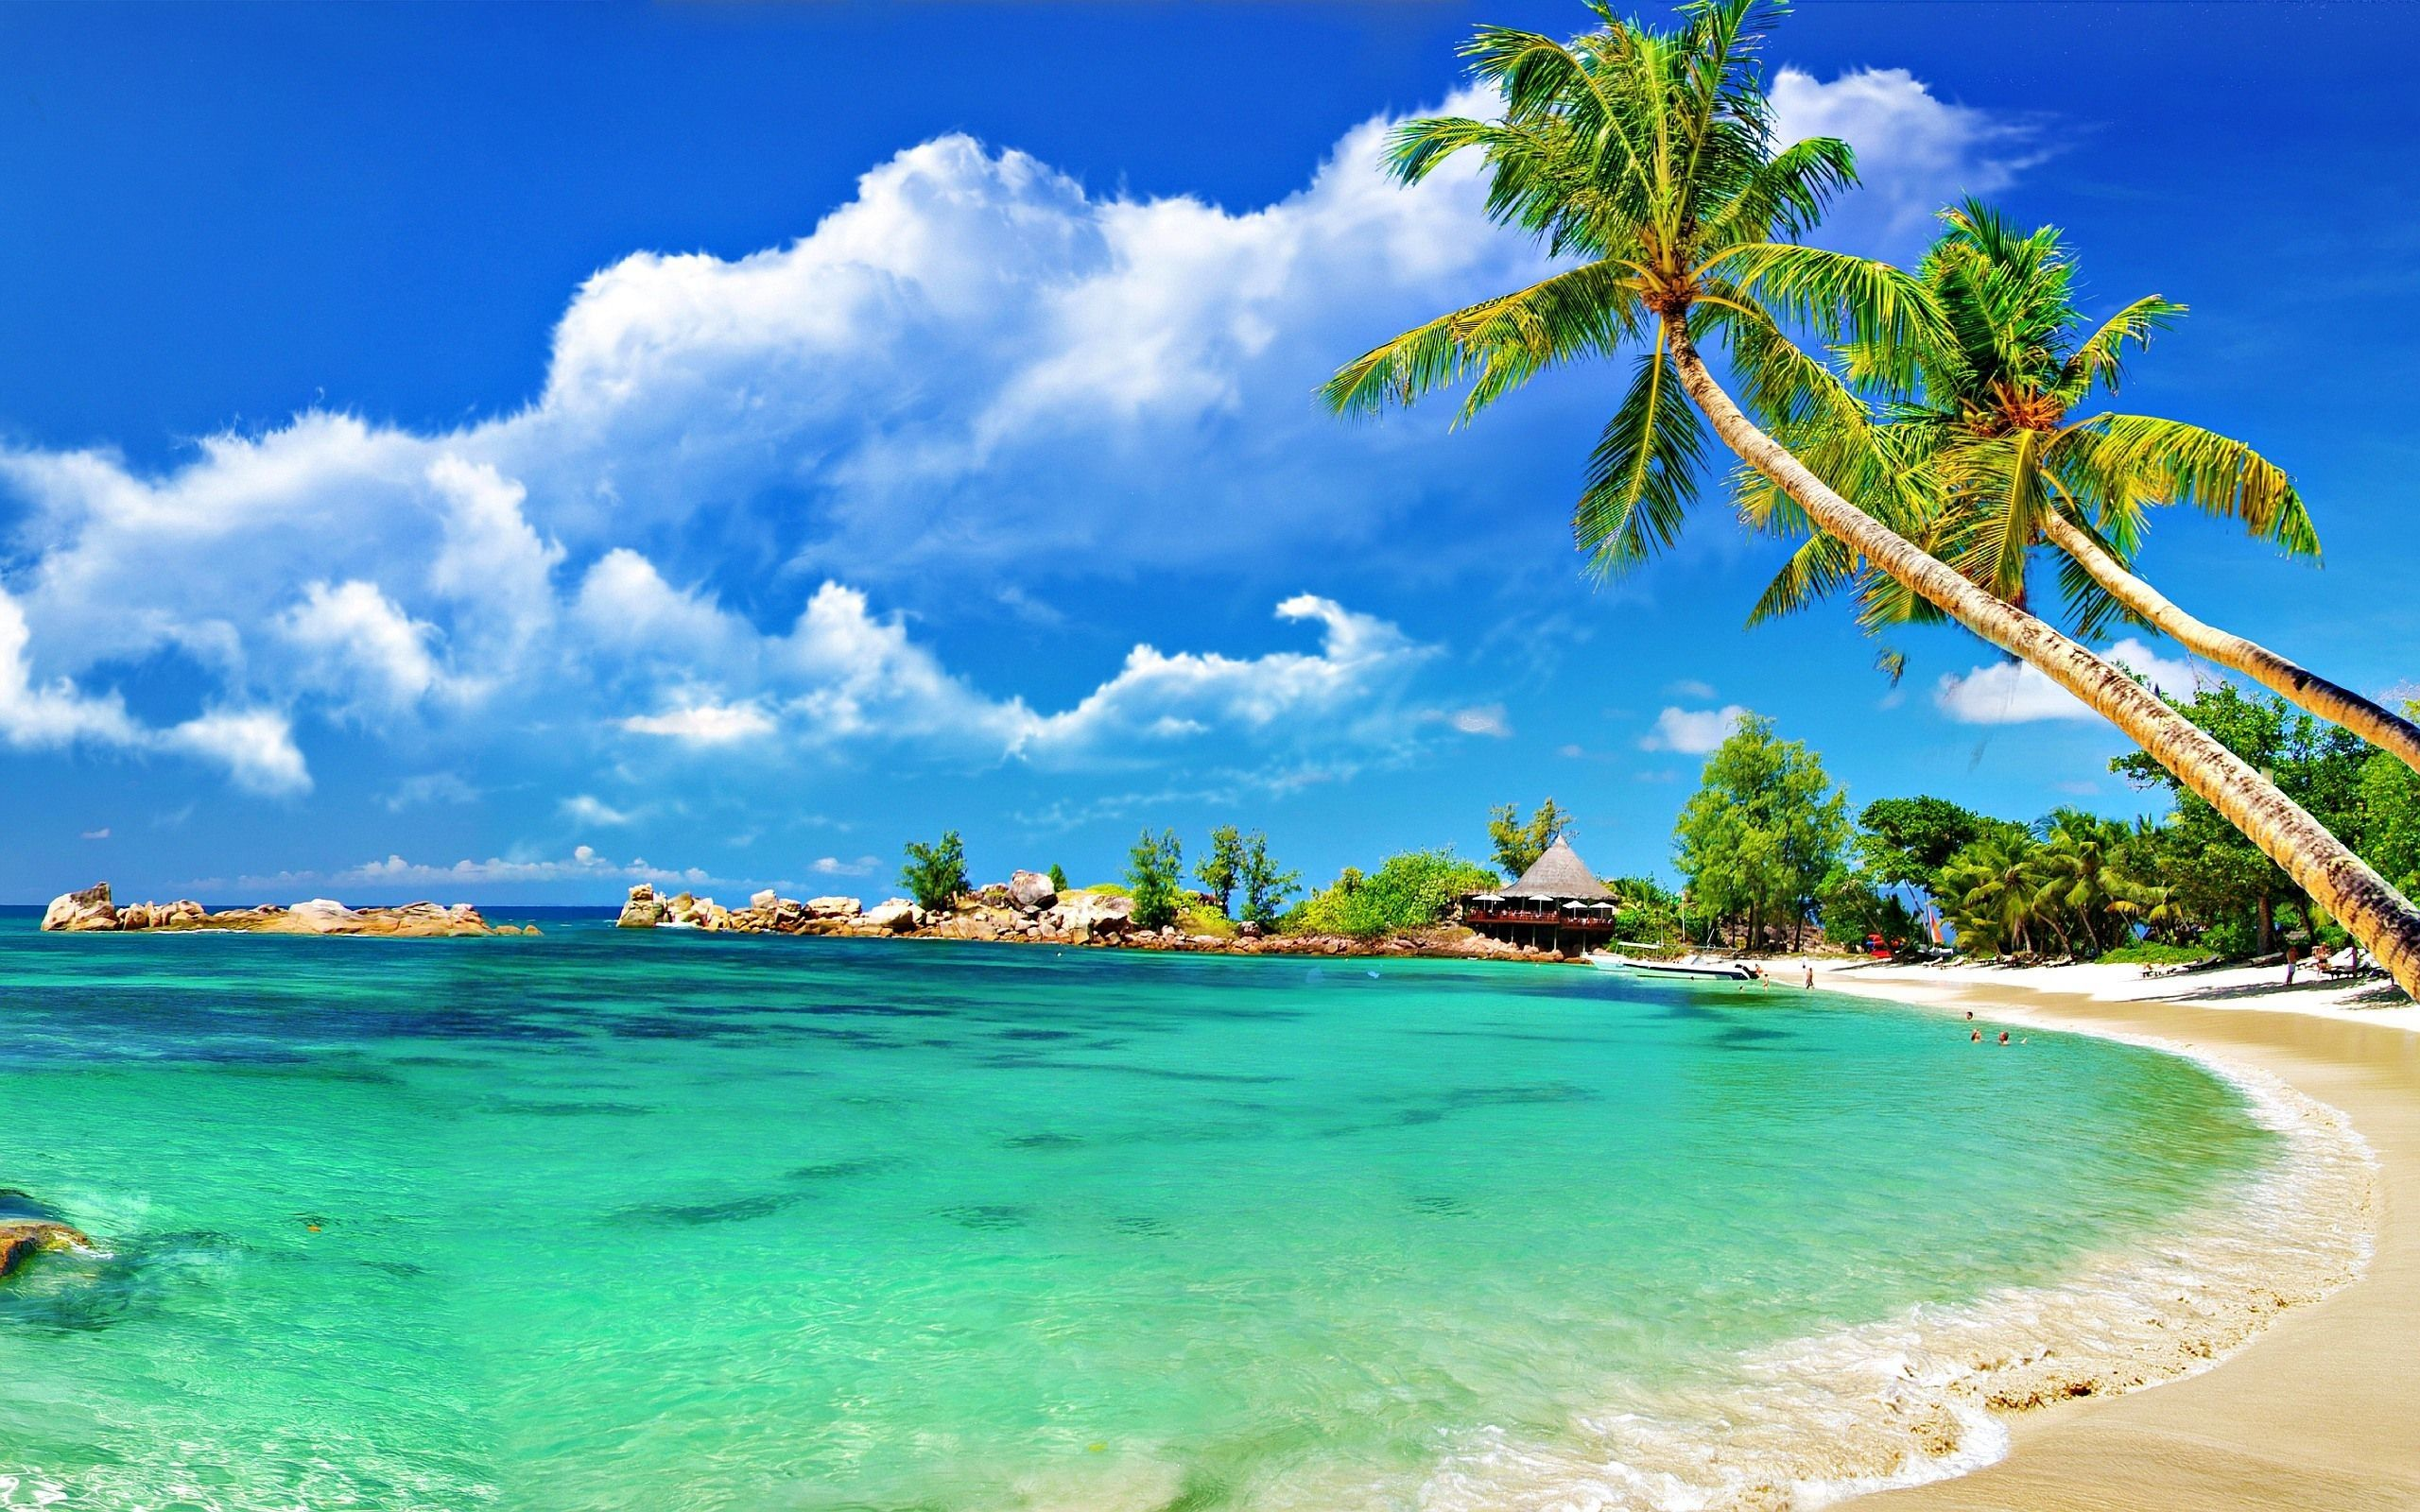 Poster Palmen Insel Mauritius Beach Morning Medium NEU